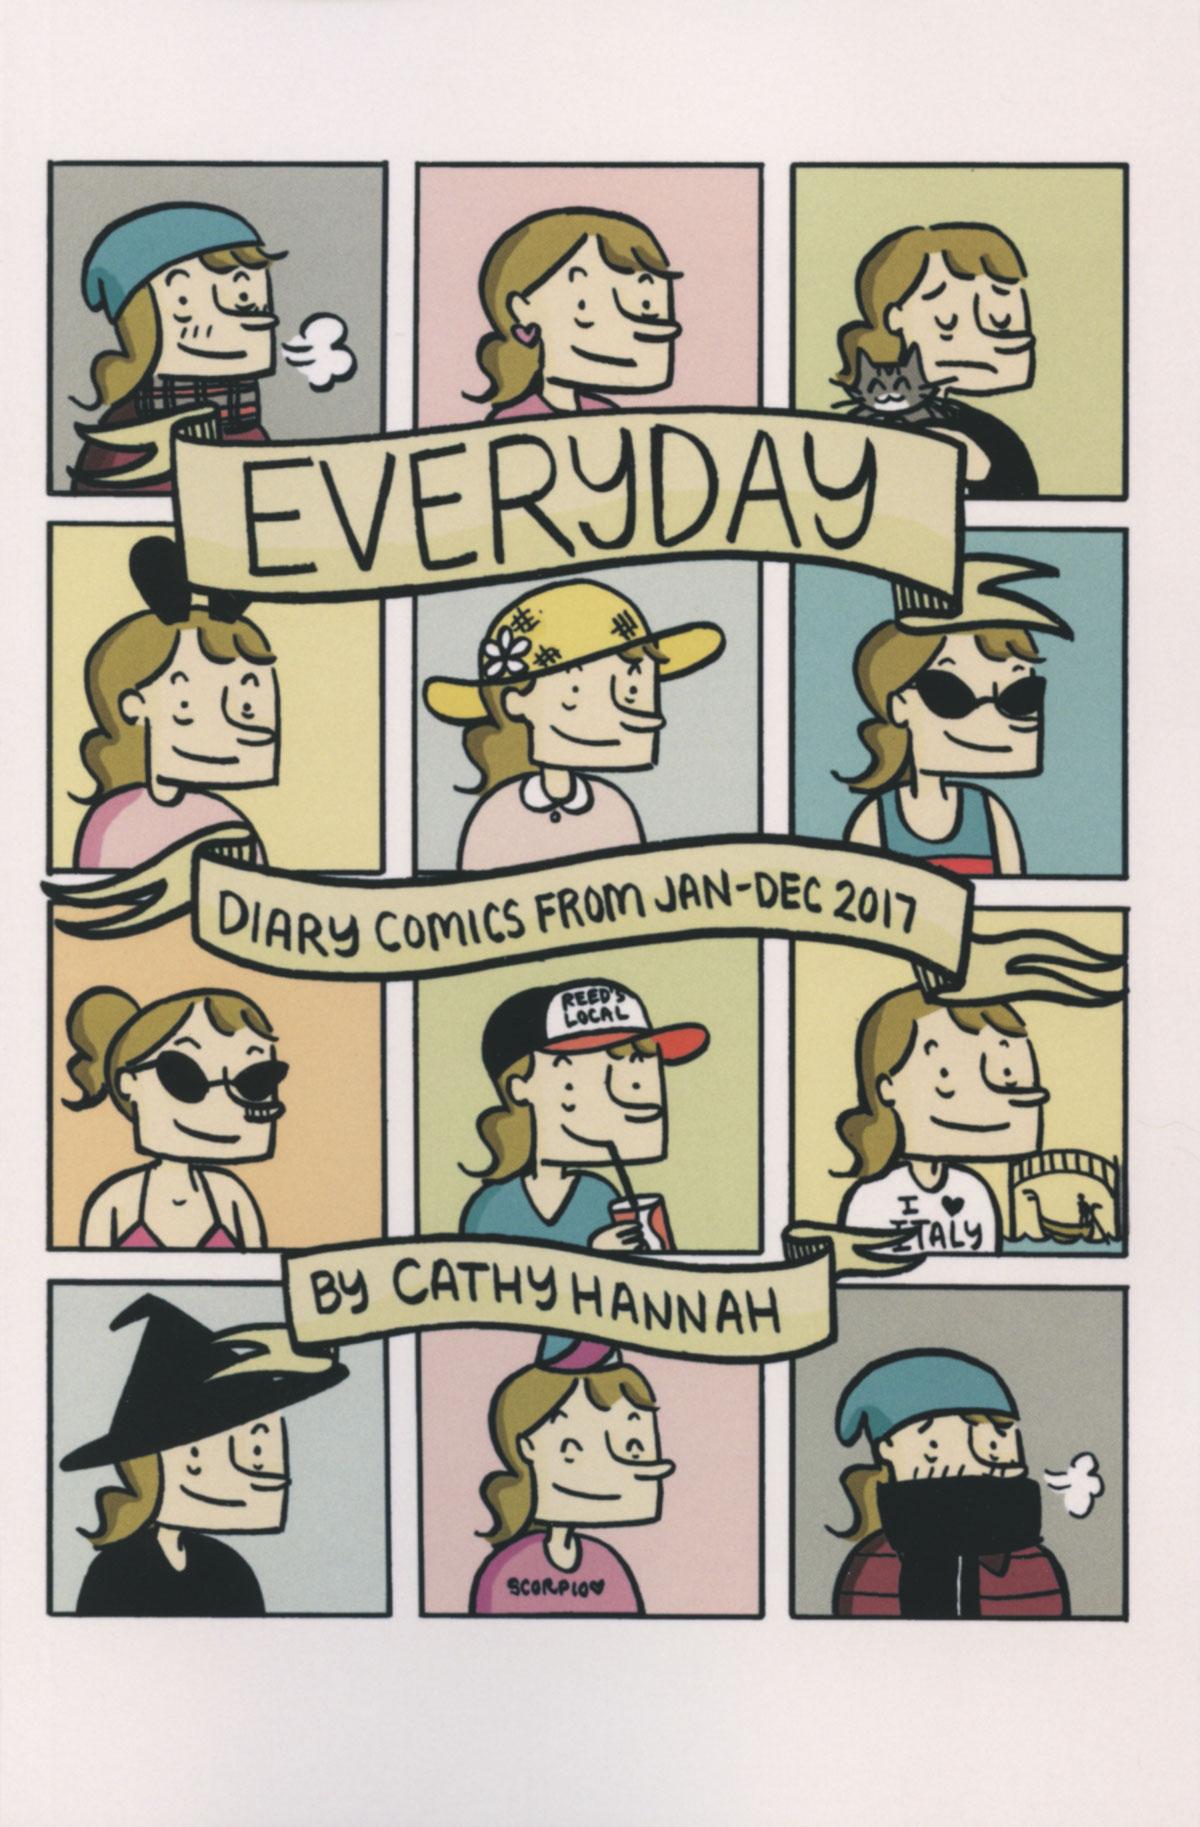 Everyday by Cathy Hannah